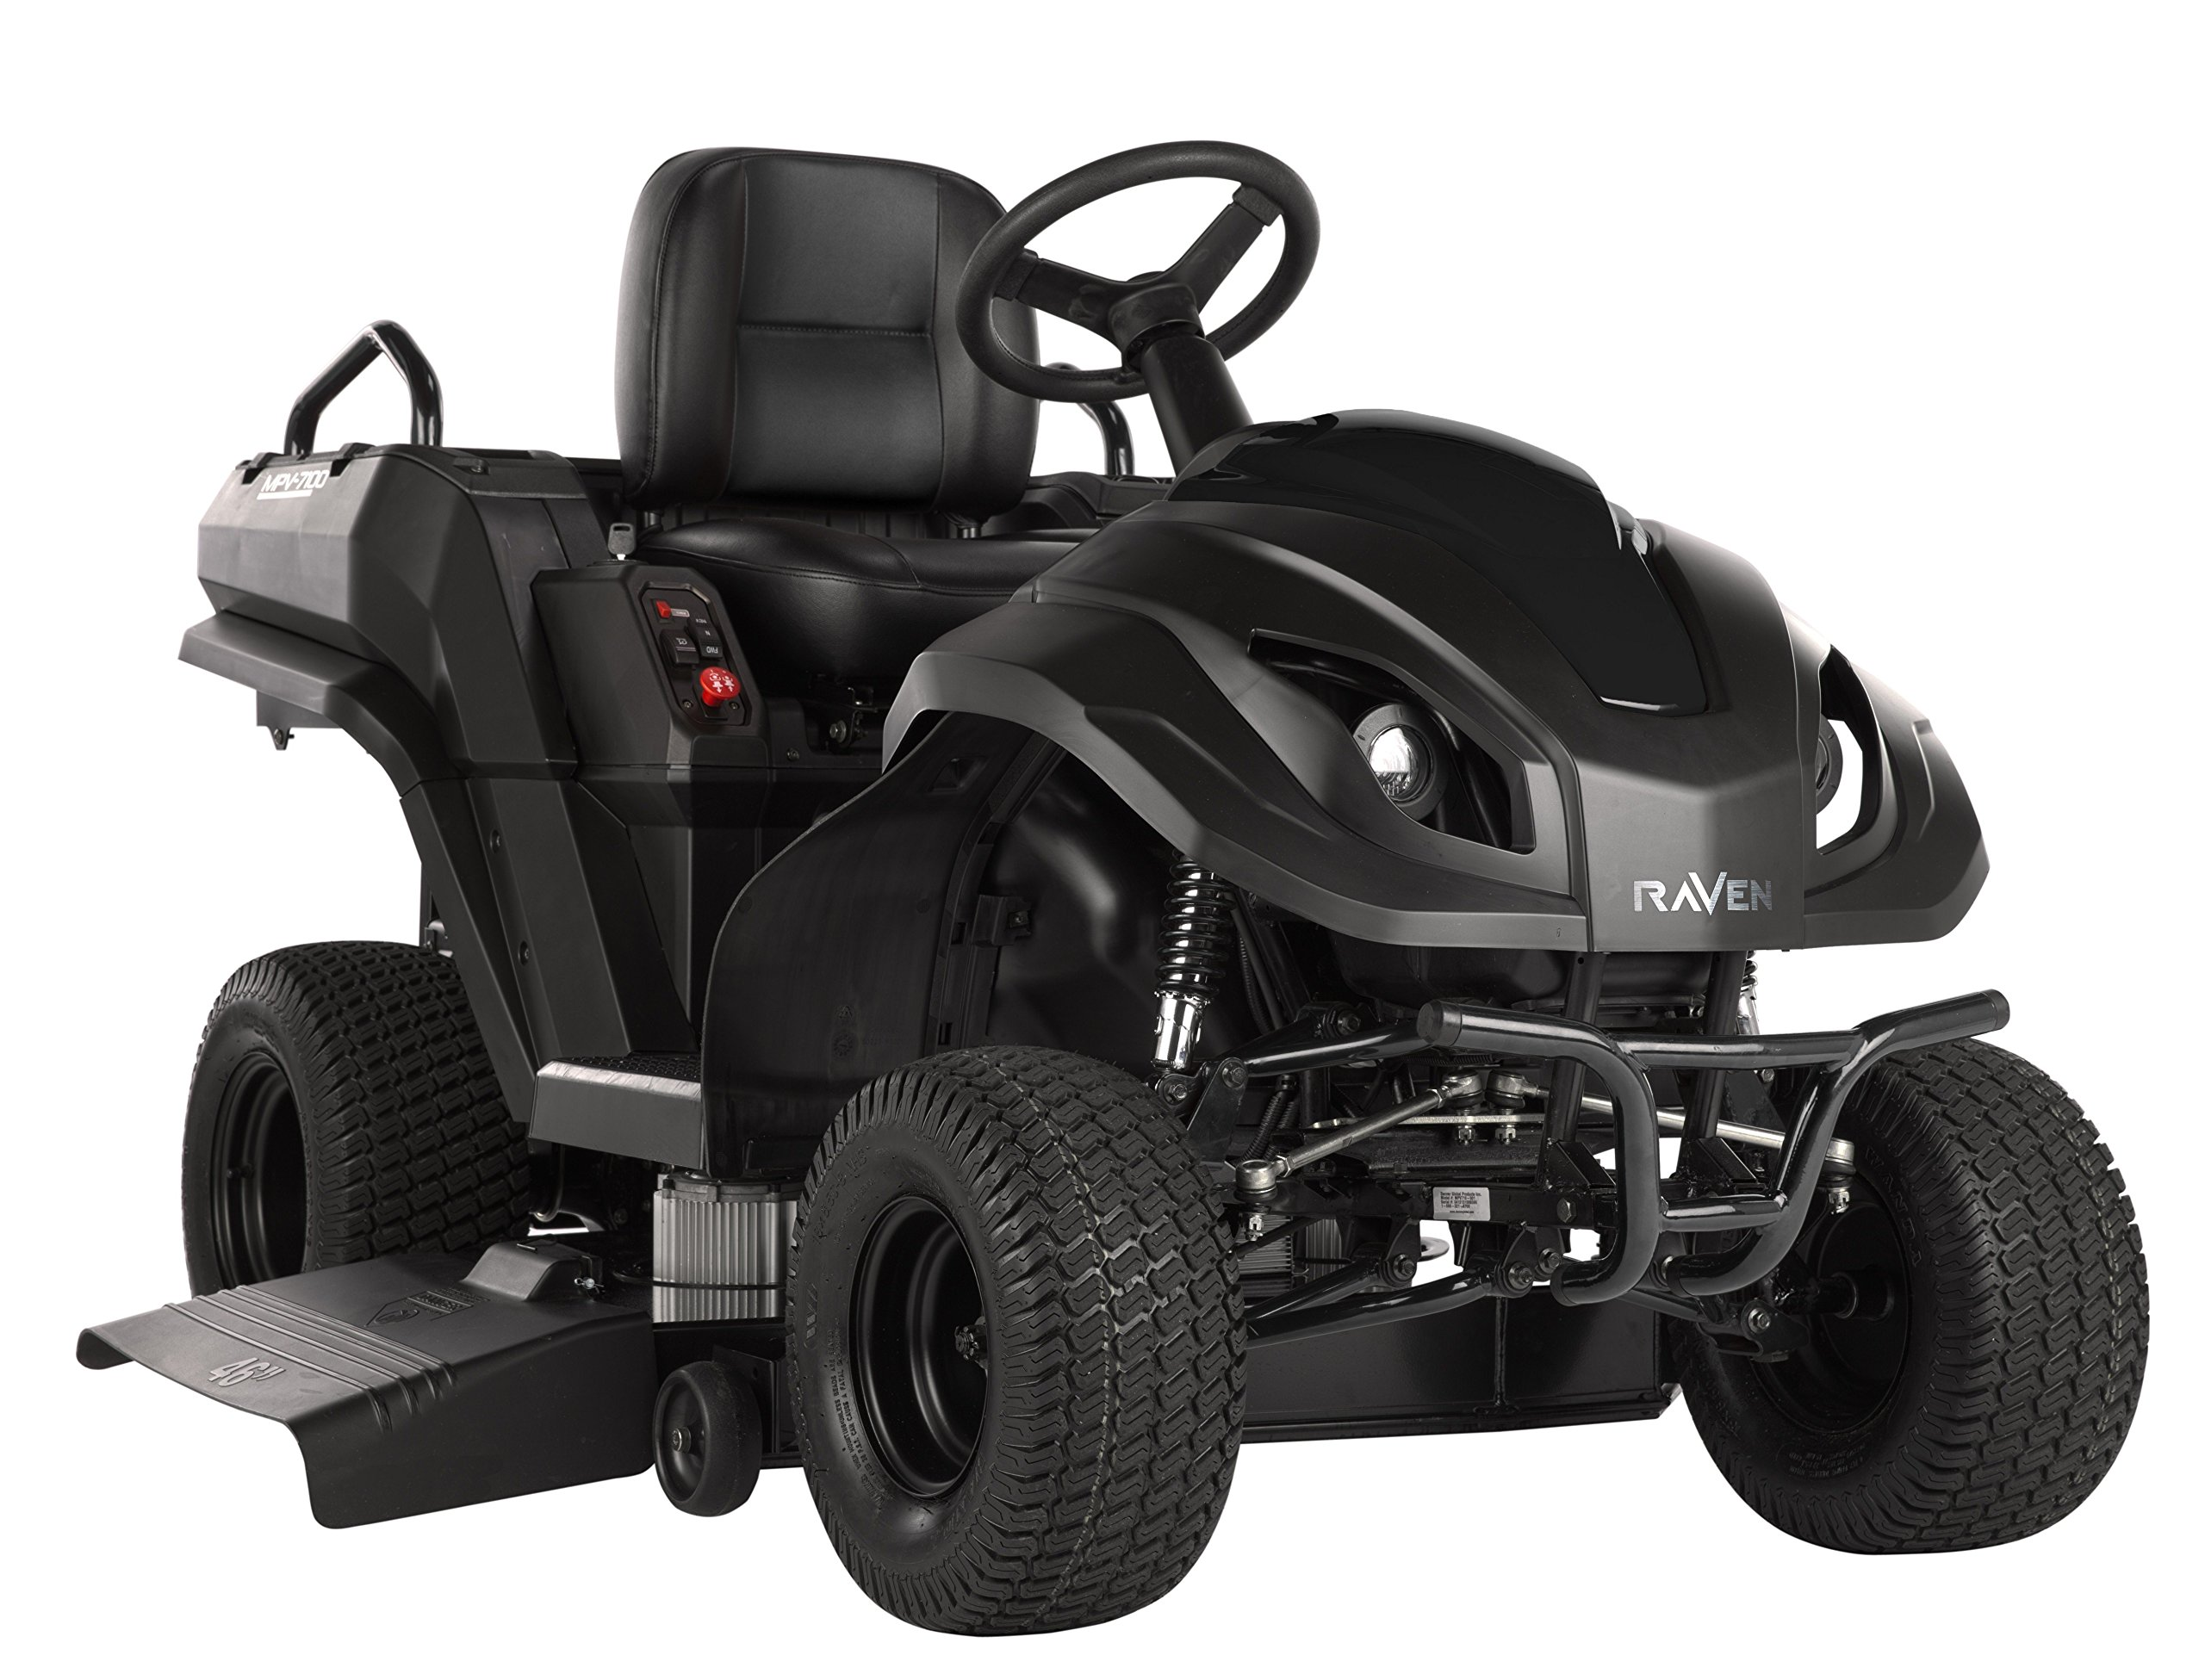 Raven MPV7100B Hybrid Riding Lawnmower Power Generator and Utility Vehicle, Black